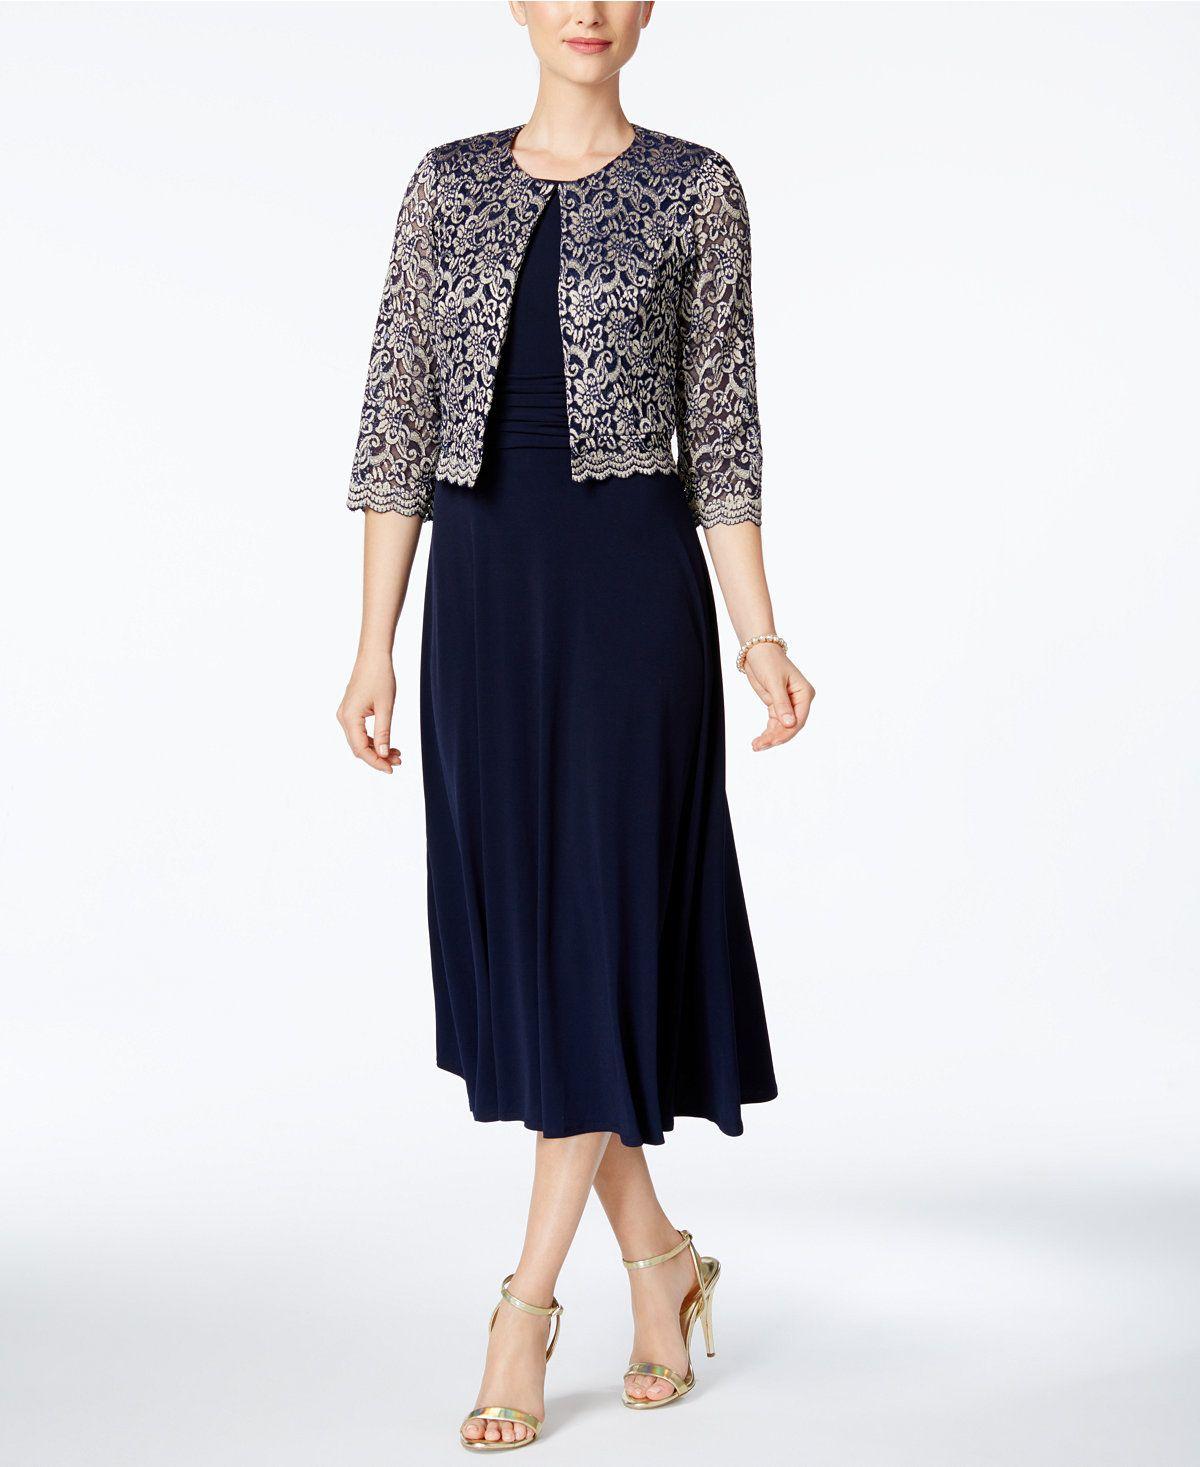 Macys womens dresses wedding  Jessica Howard Midi Dress And Lace Jacket Regular u Petite Sizes